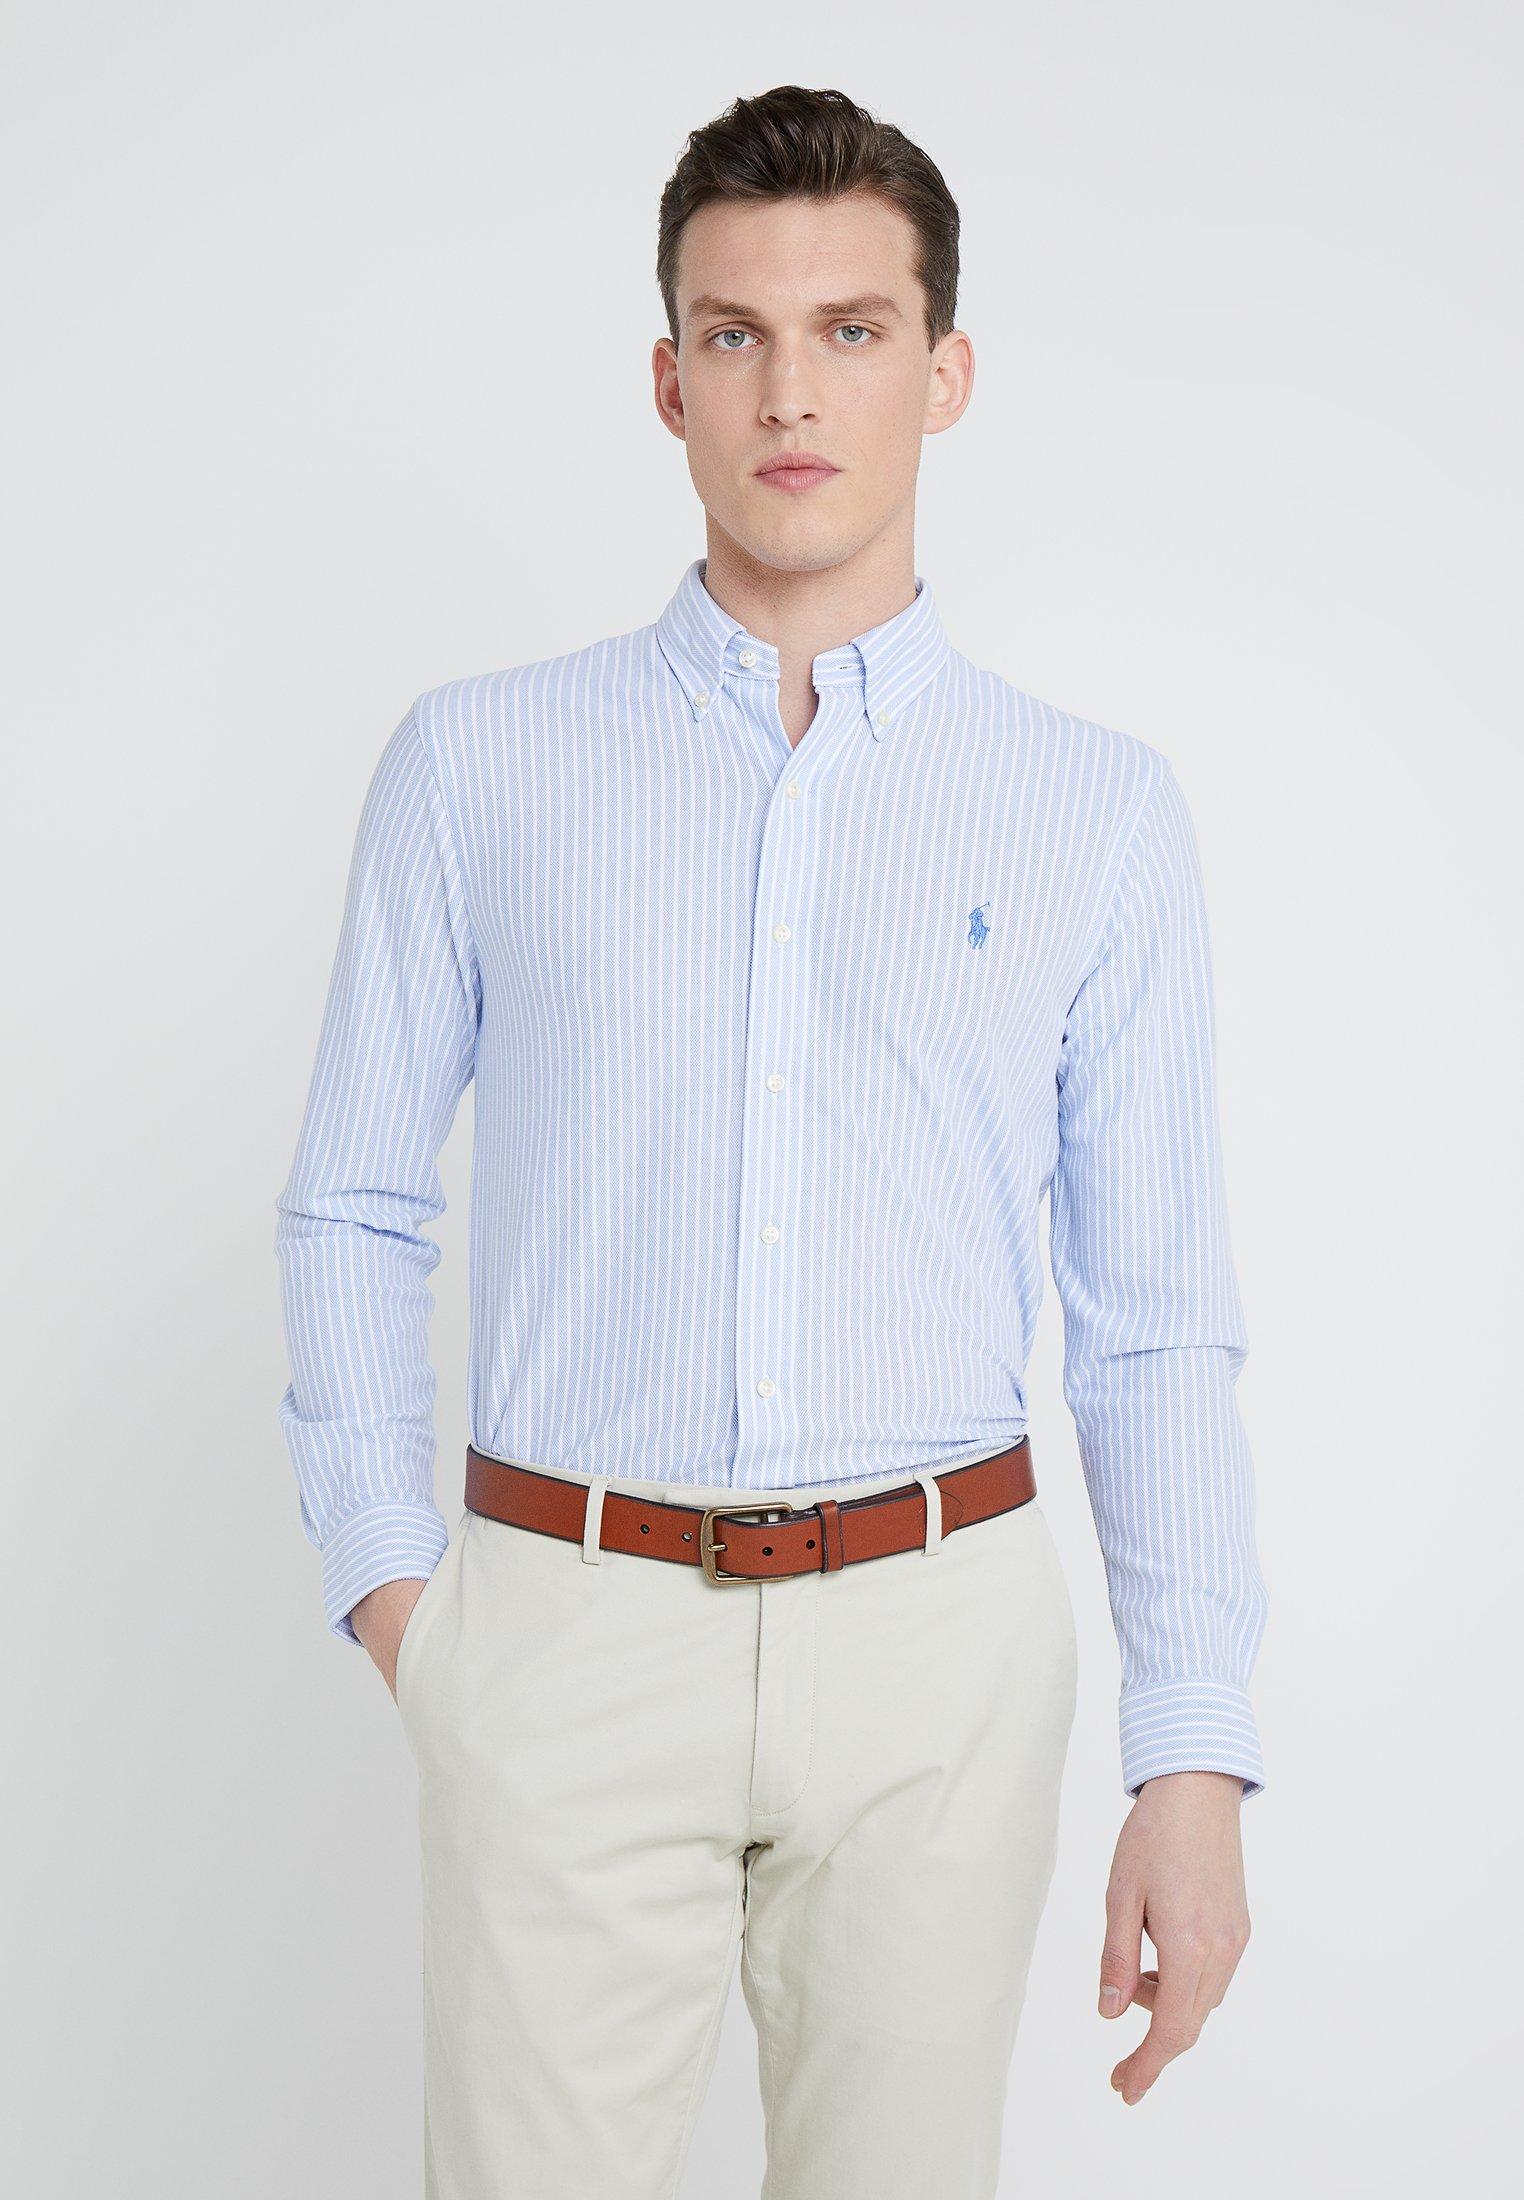 Polo Ralph Lauren OXFORD - Koszula - light blue/white